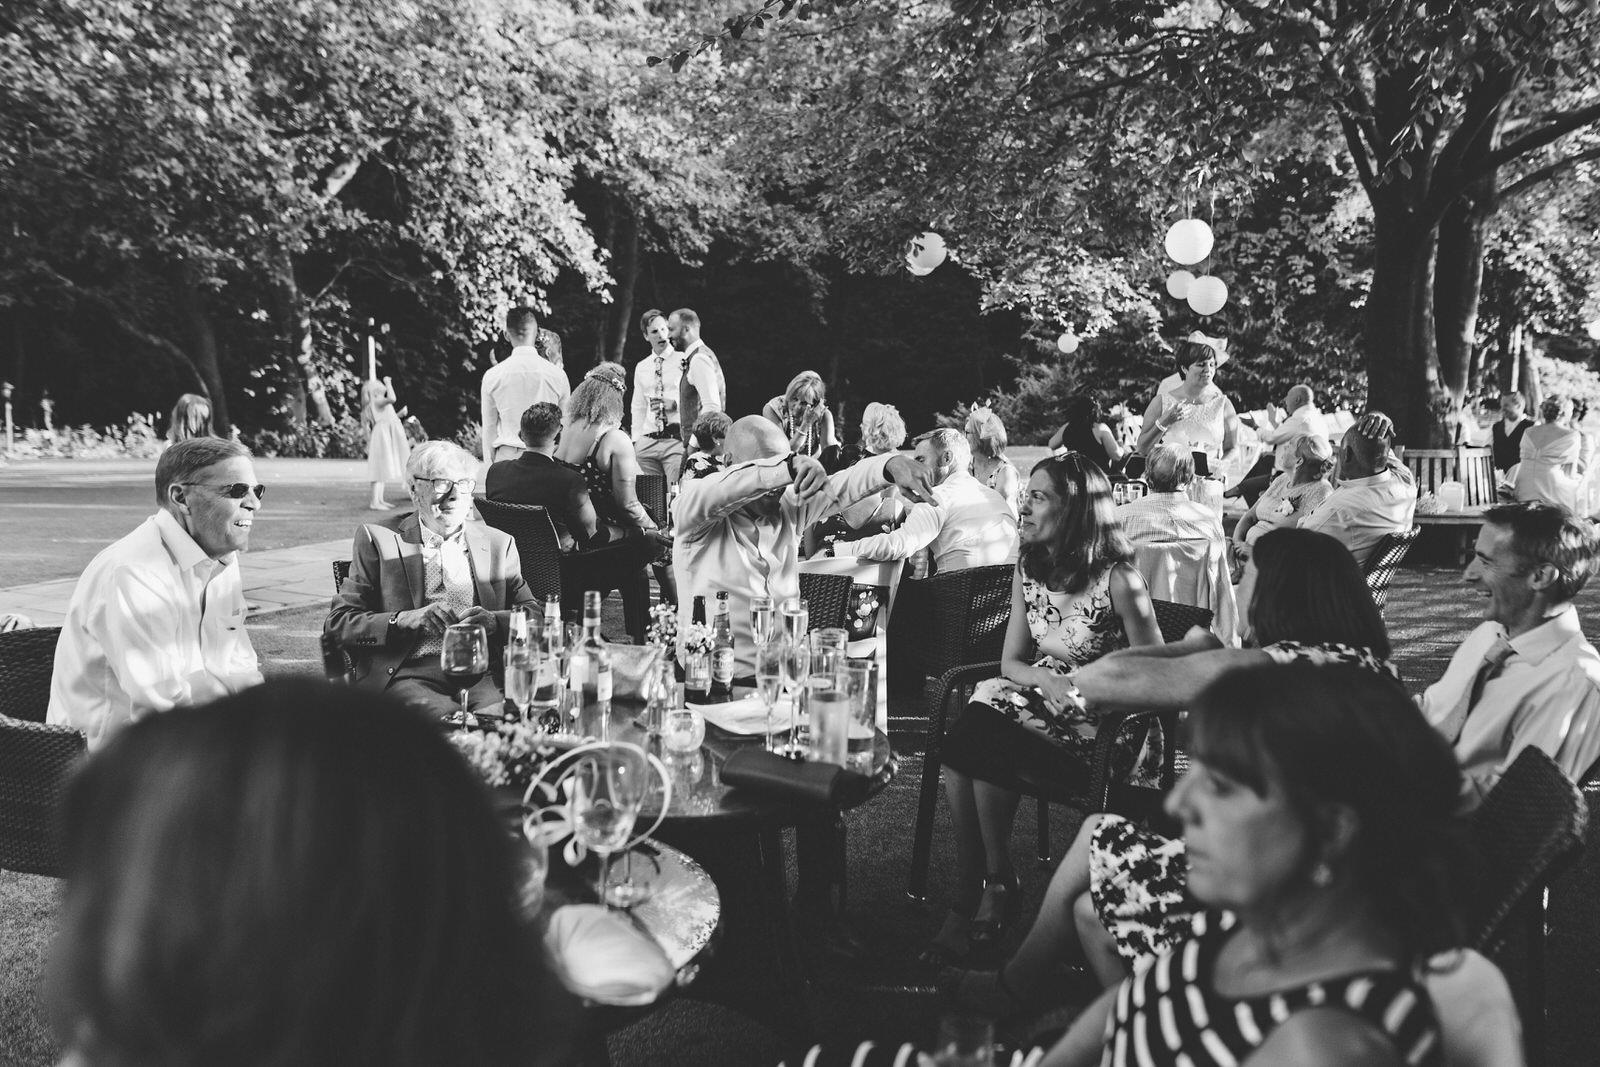 Moddershall-Oaks-Spa-Wedding-Photographer-067.jpg